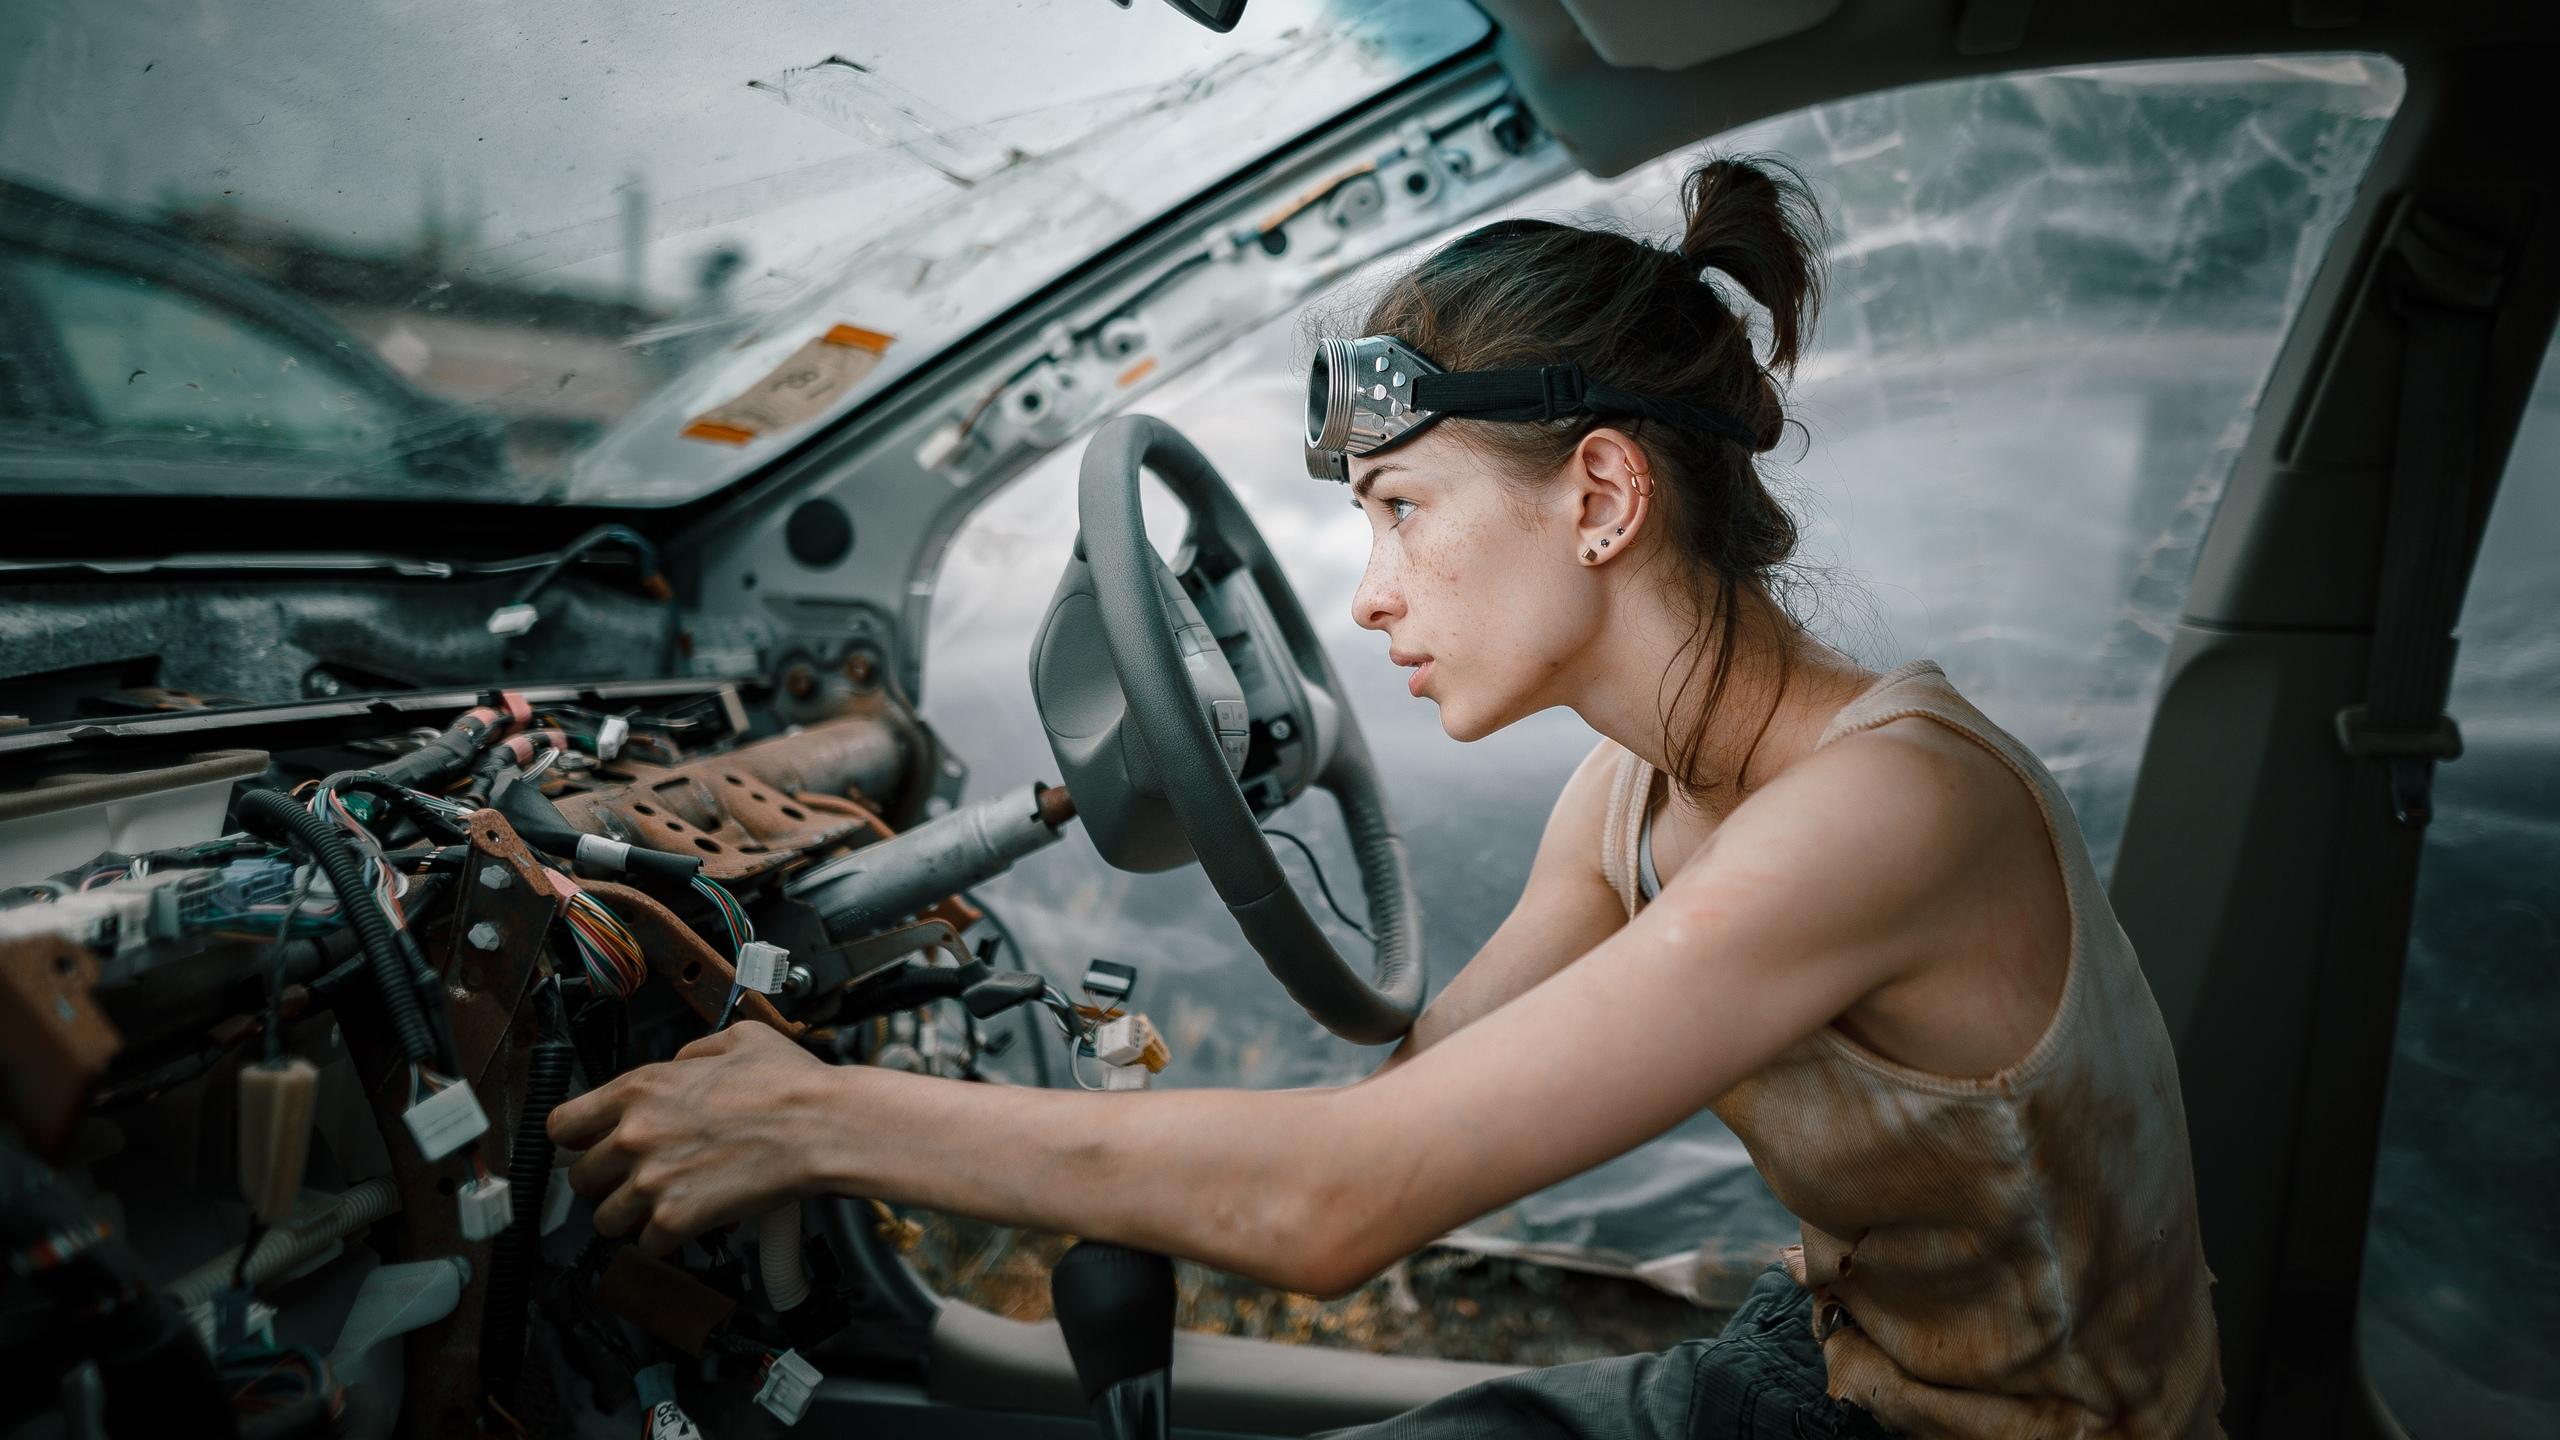 https://youngfolks.ru/pub/photograph-andrey-vasilyev-model-elizaveta-trofimova